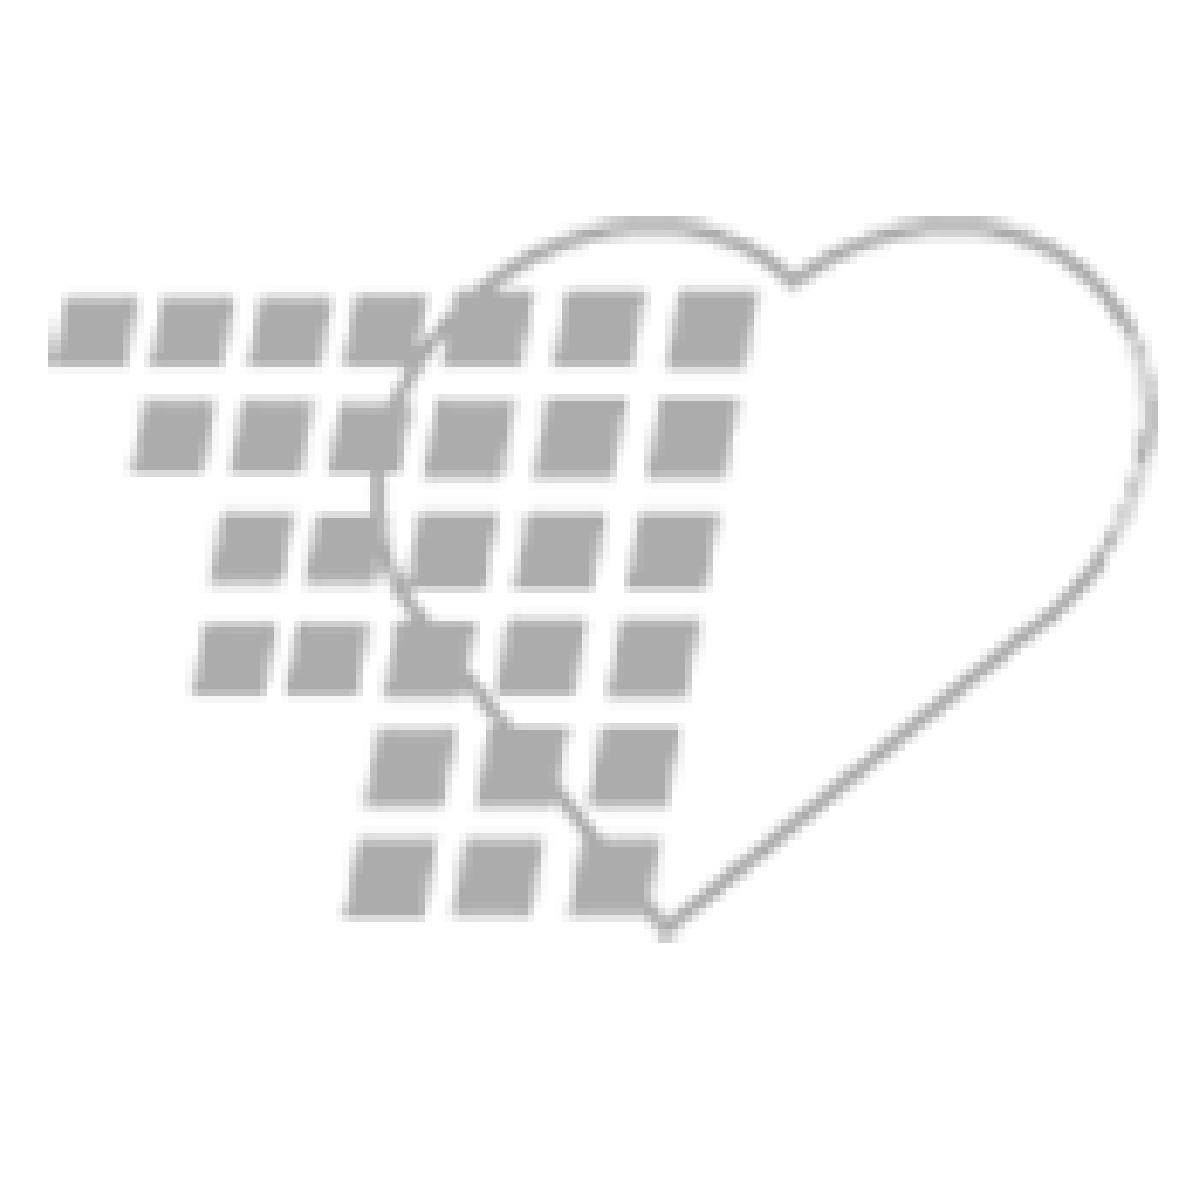 11-81-3751 Laerdal Fundus Skills Assessment TaskTrainer